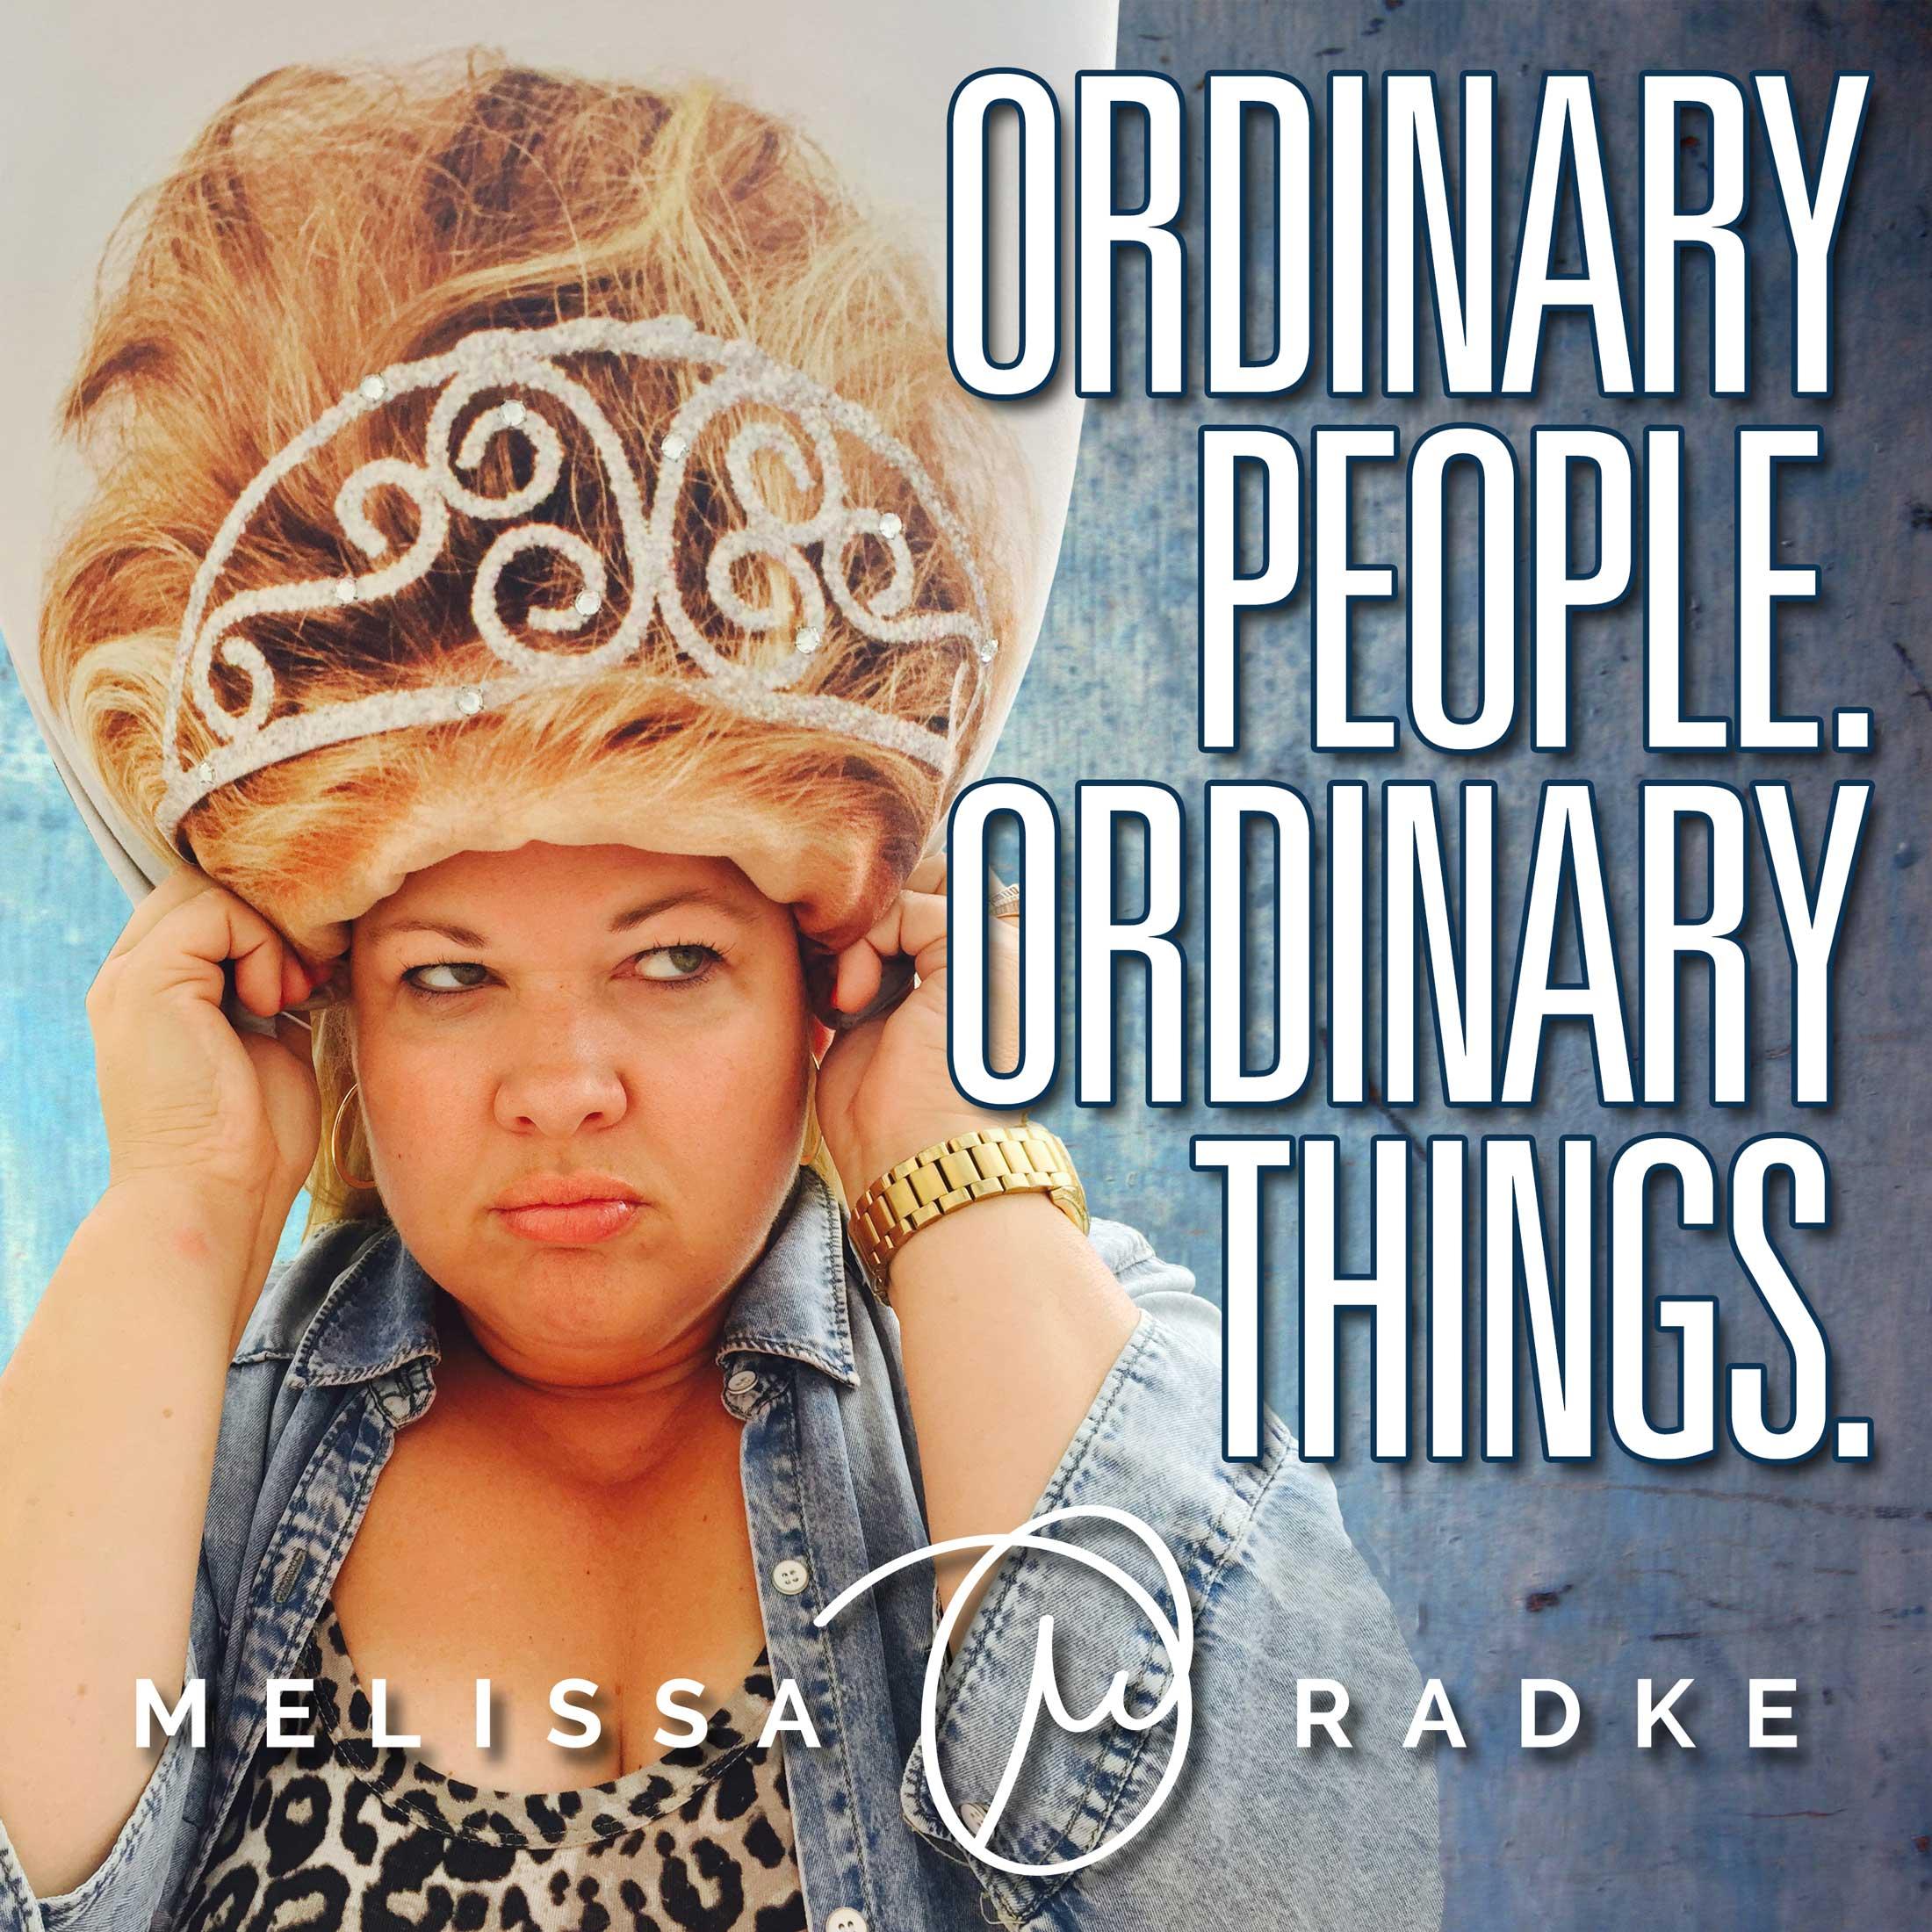 Ordinary People. Ordinary Things. with Melissa Radke show art